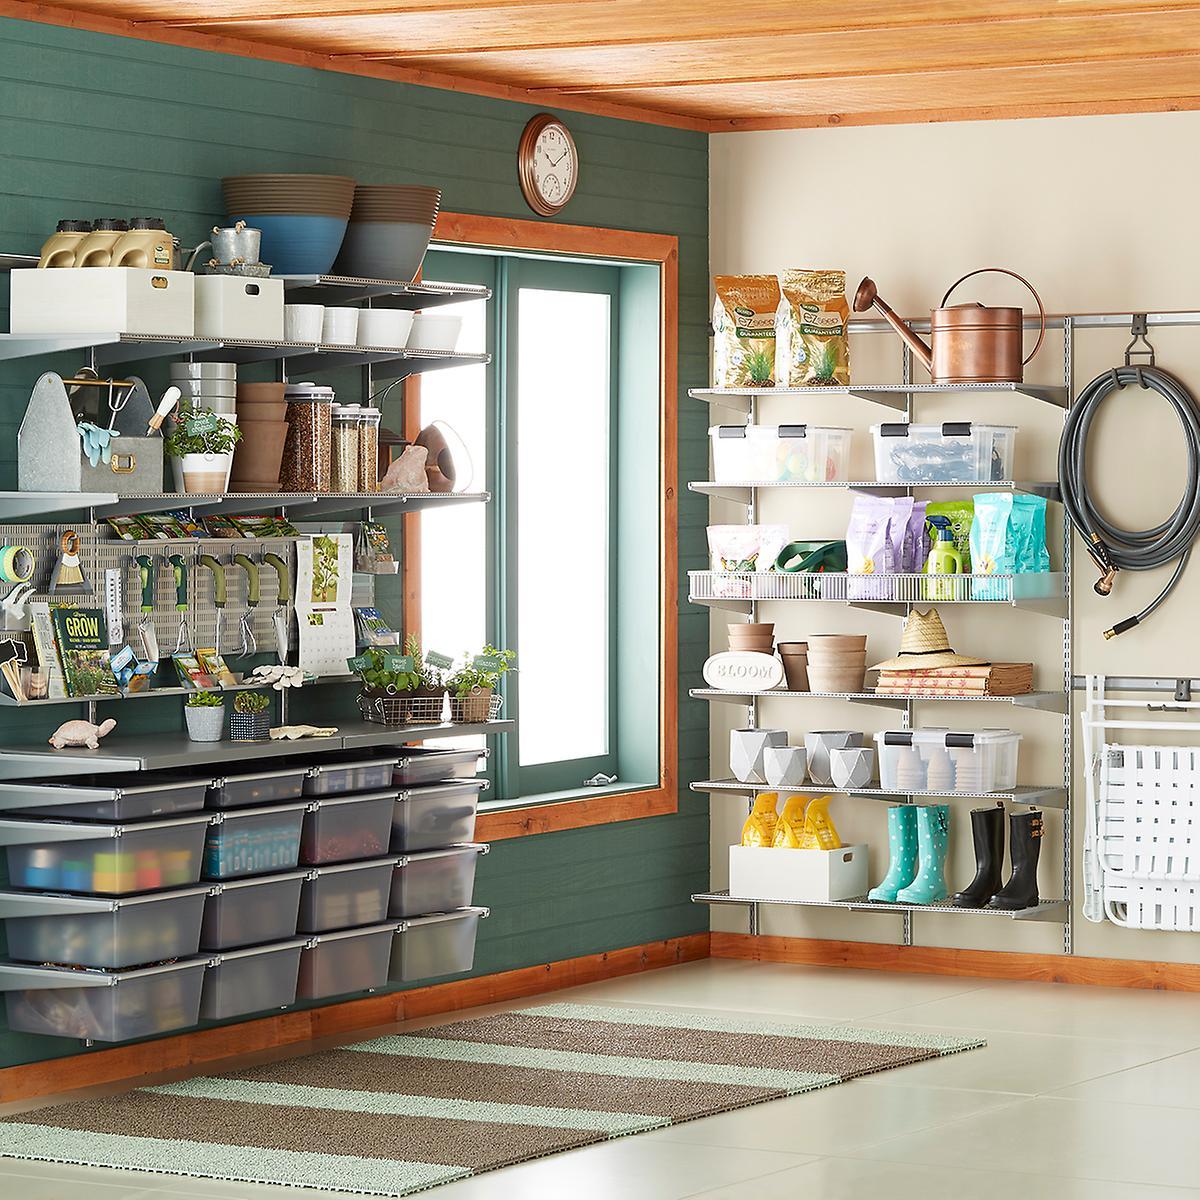 used store fixtures for garages idaho falls ideas - Platinum elfa utility Garage